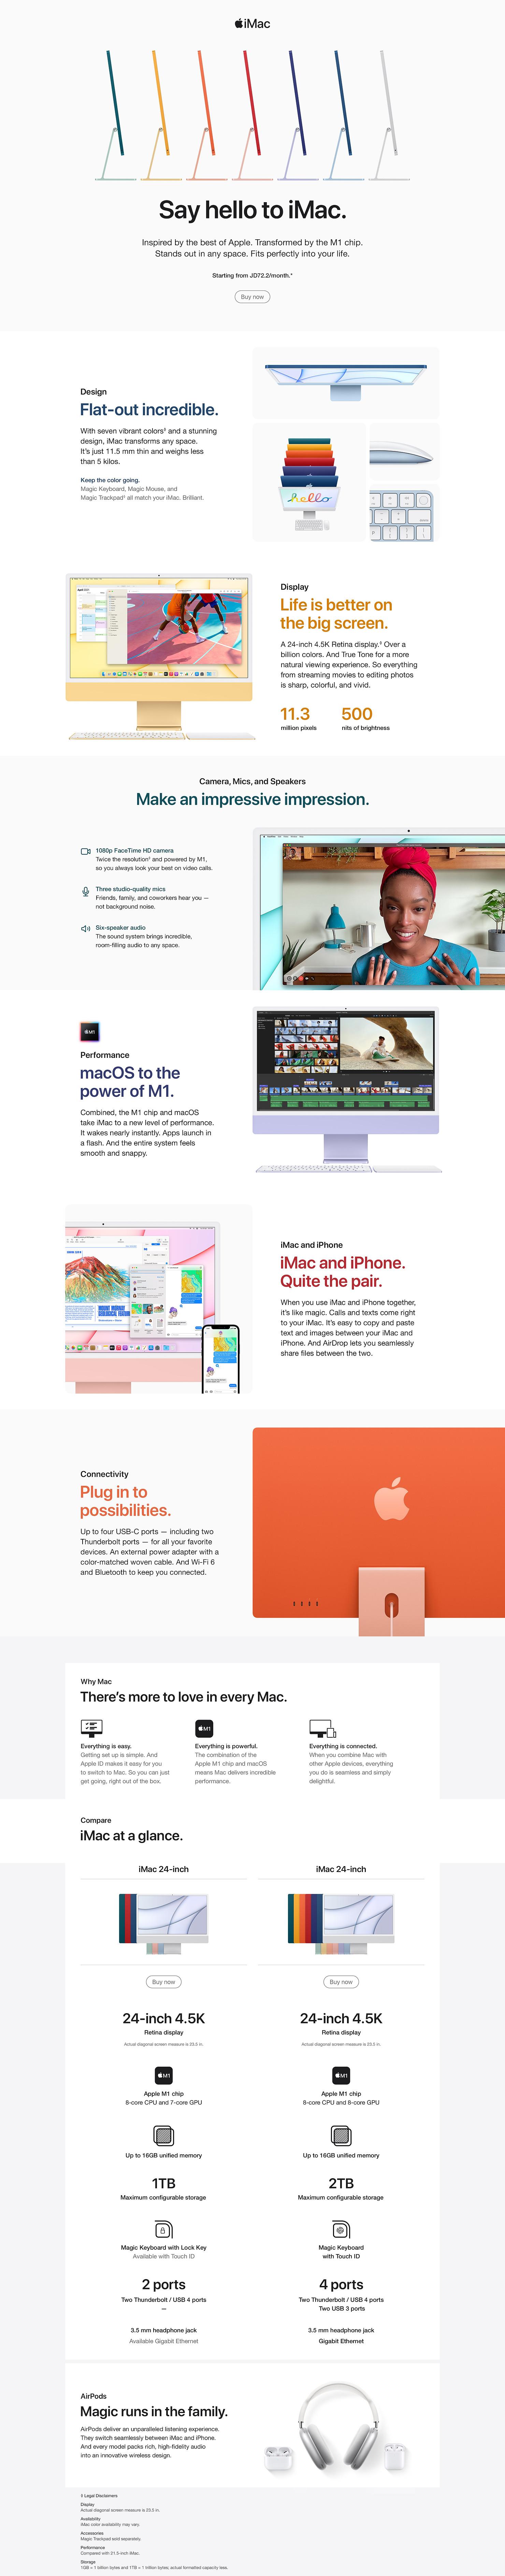 MEEN-iMac_Marketing_Page_L_v1 (3).jpg